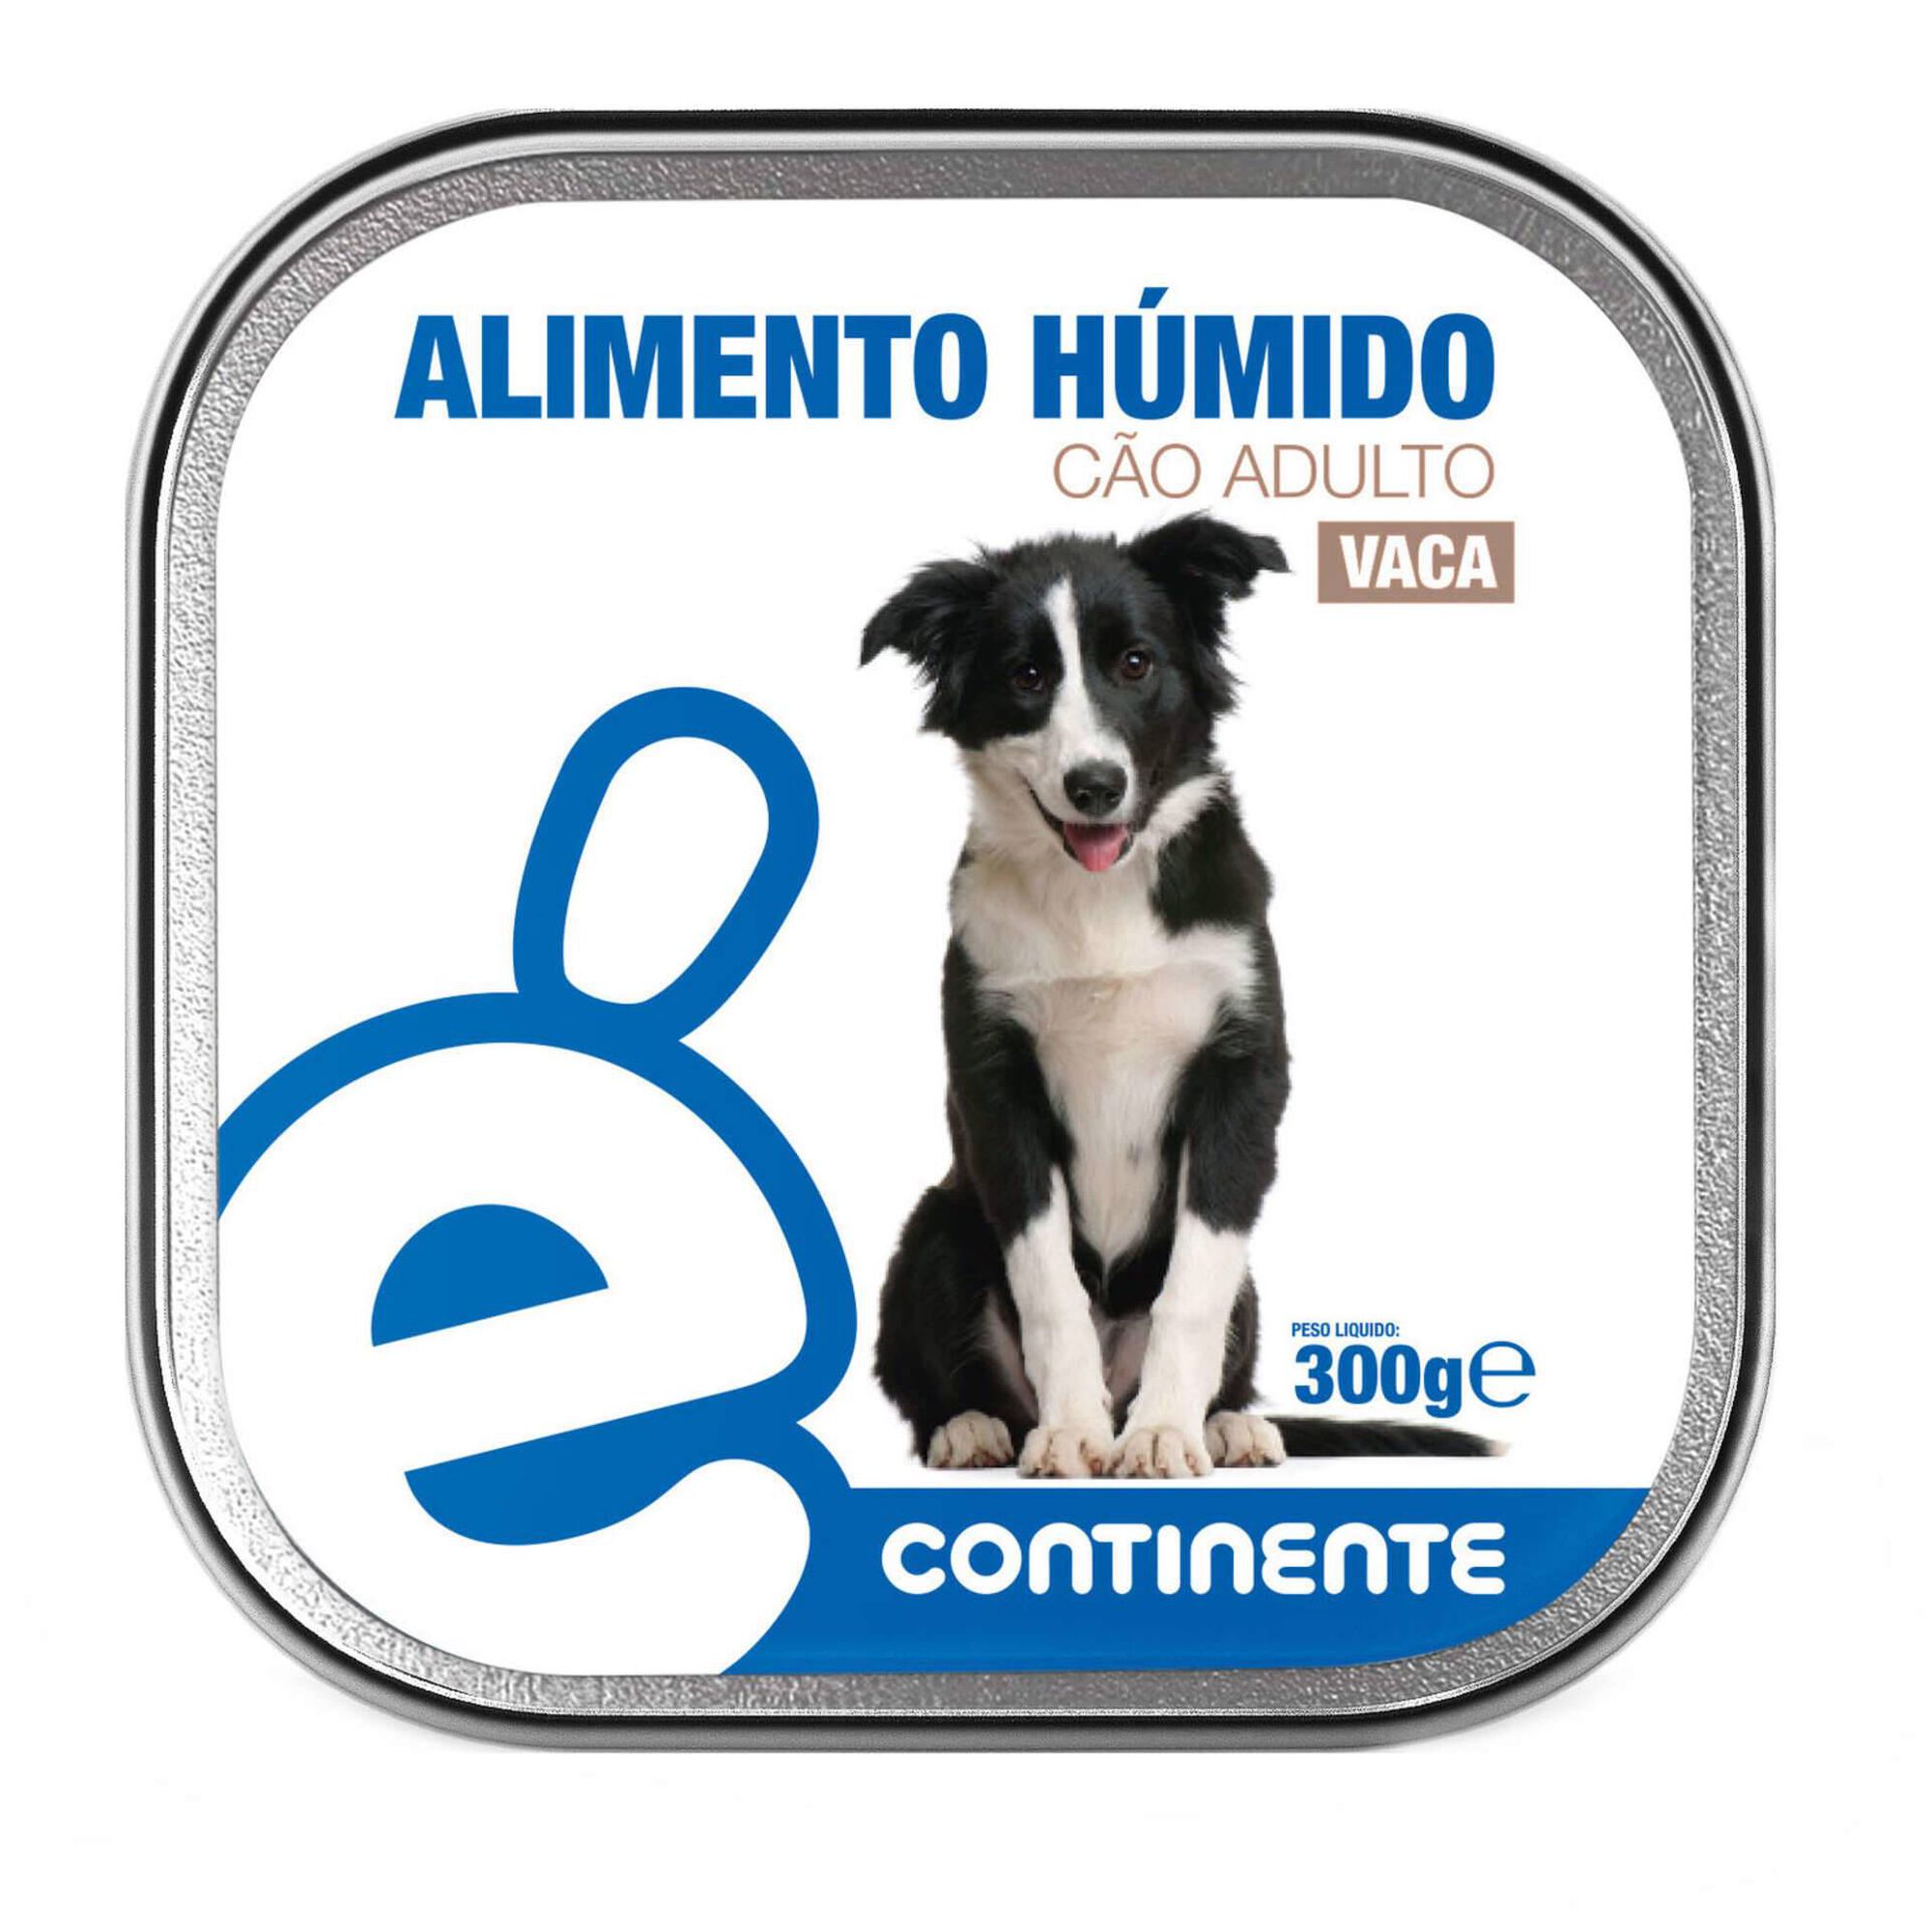 Comida Húmida para Cão Adulto Vaca Terrina